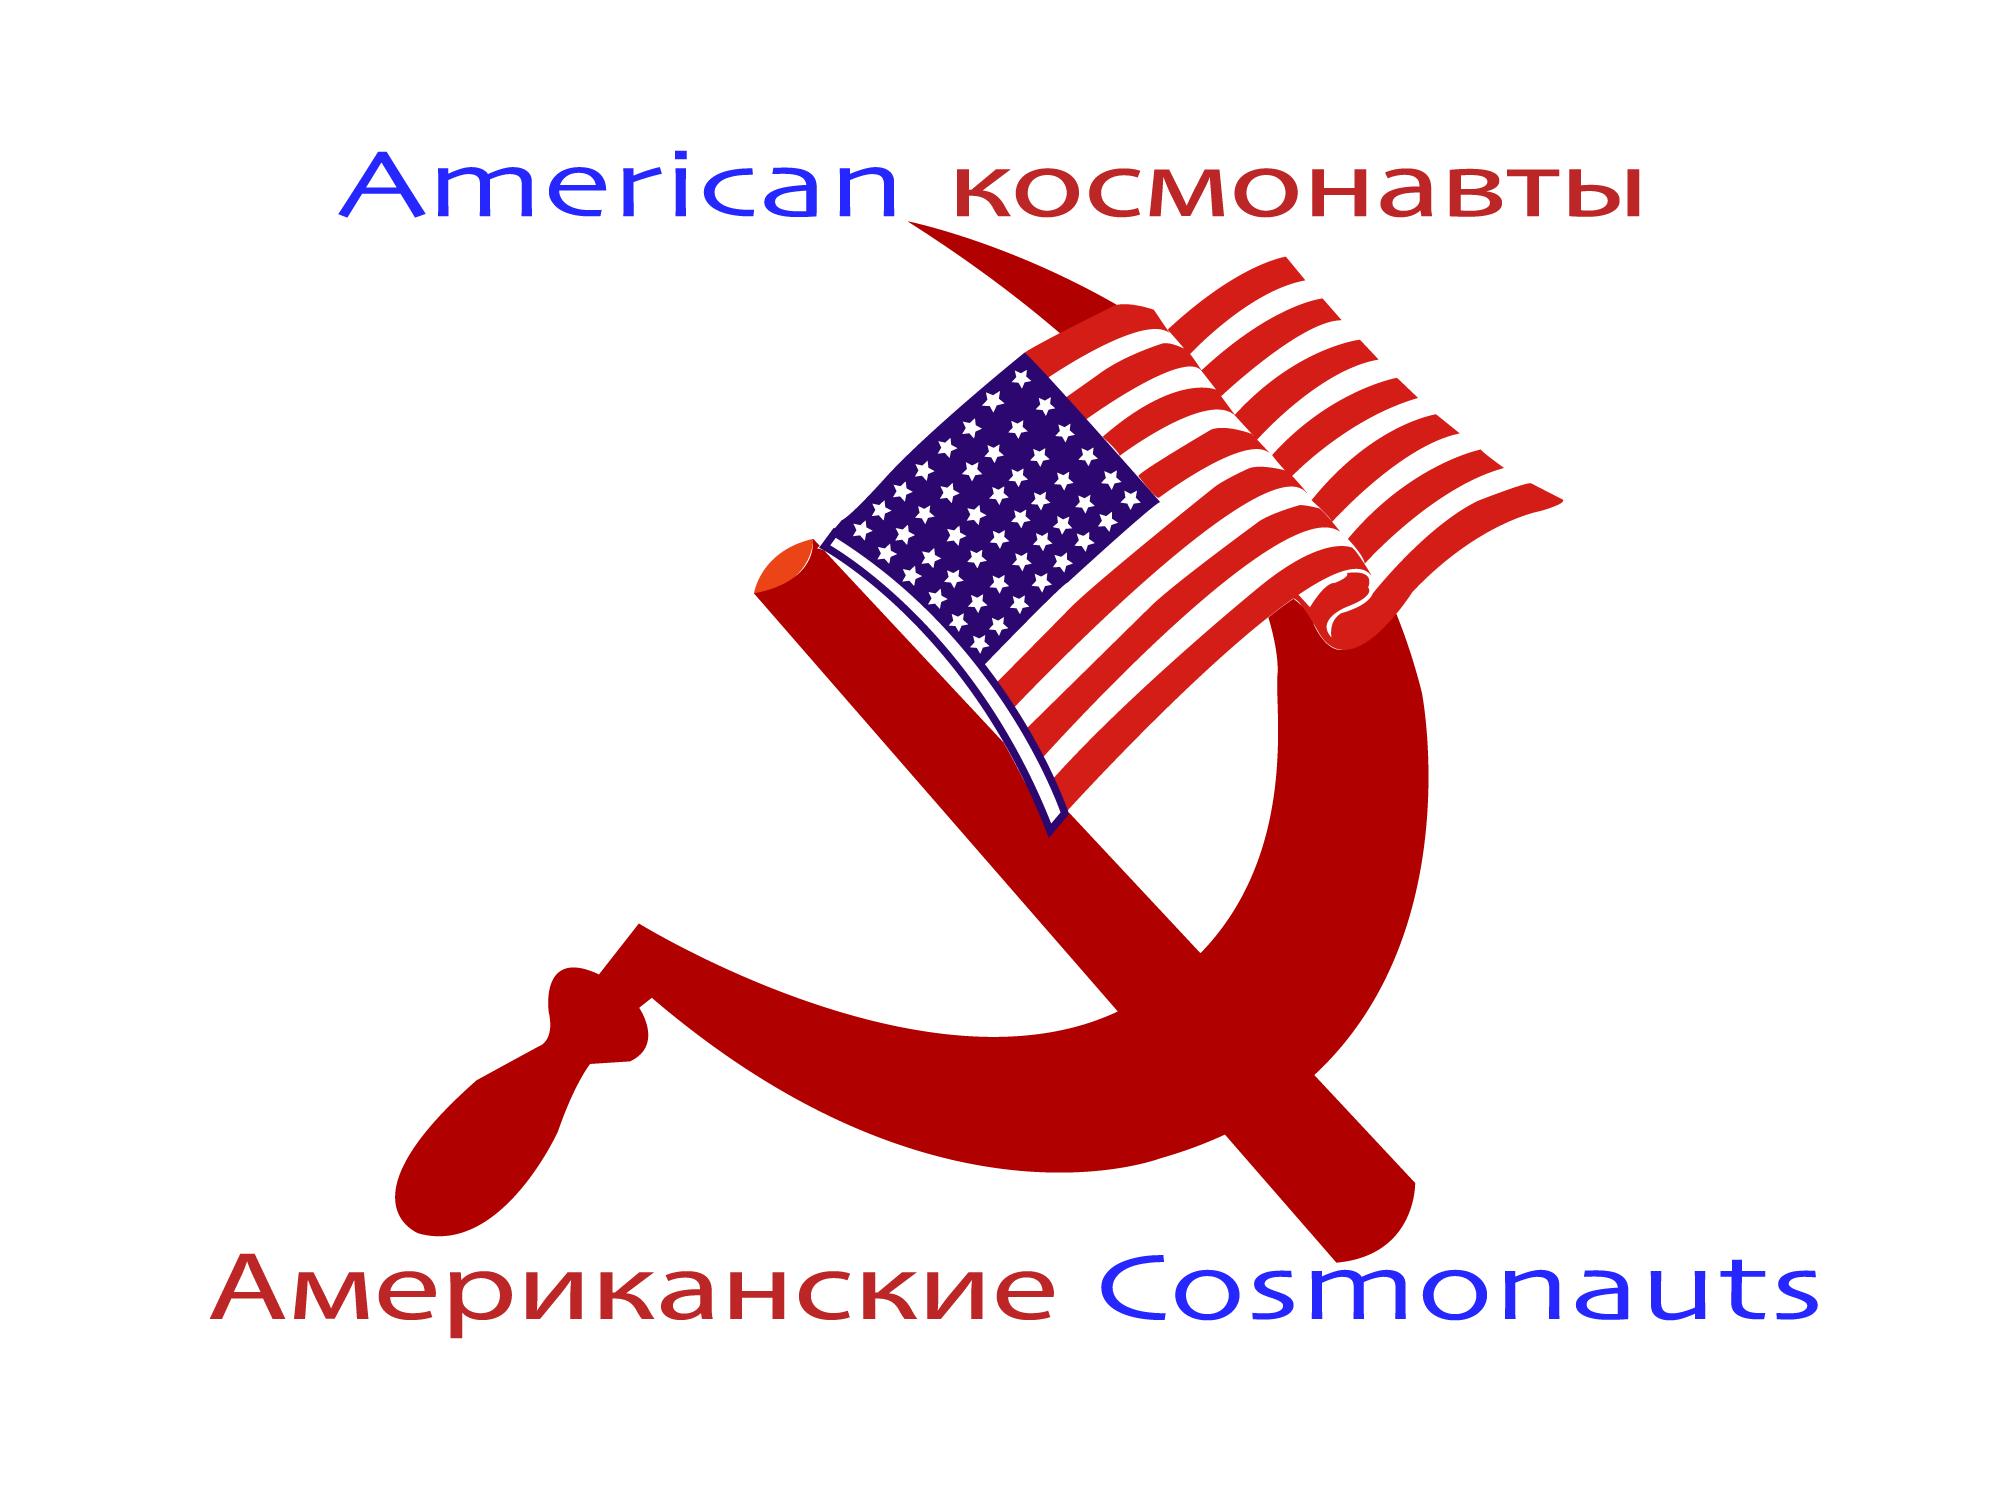 American Cosmonauts